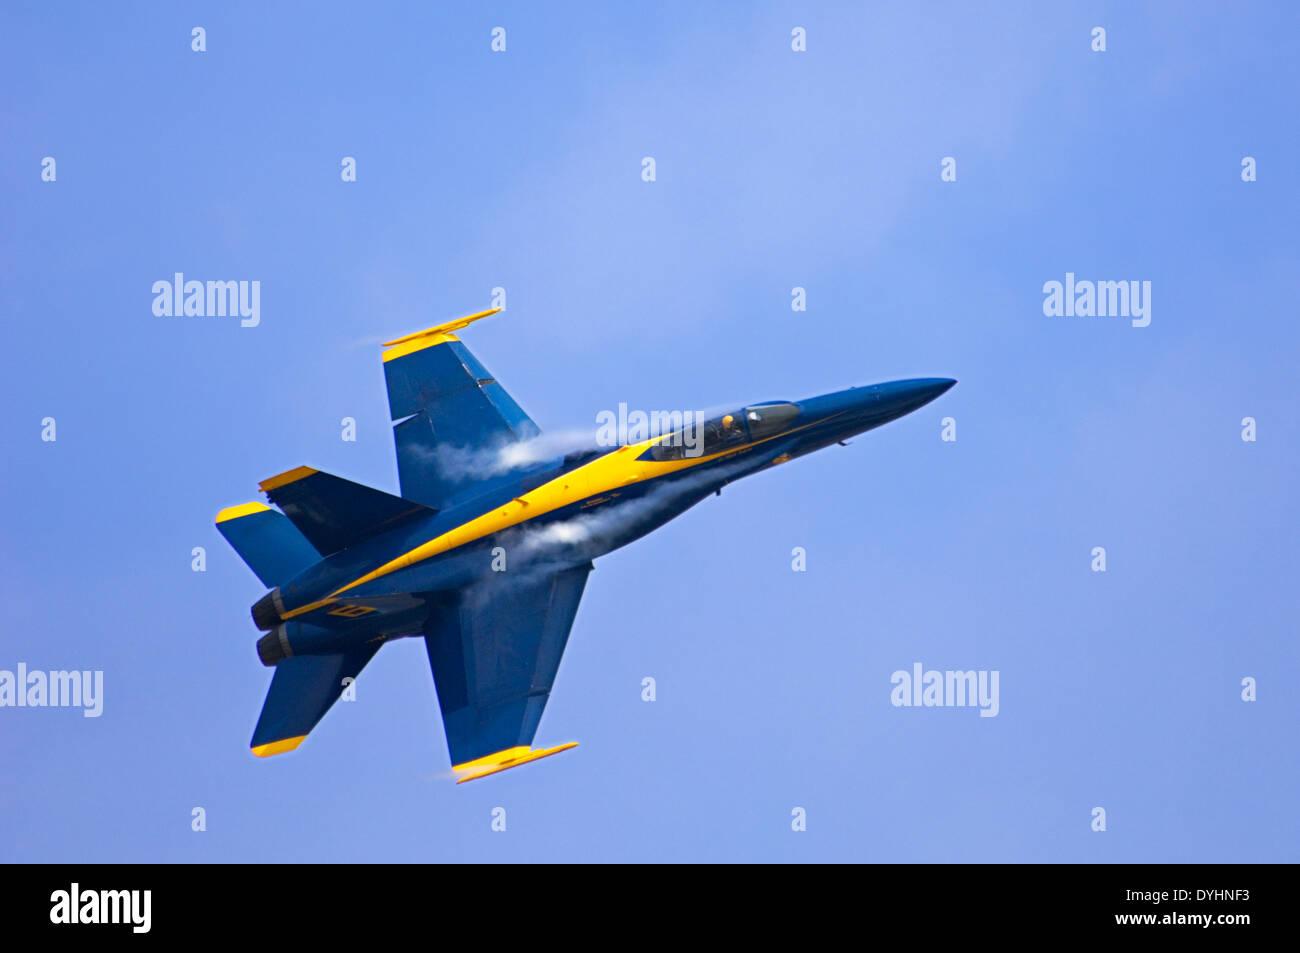 Fighter Pilot Stock Photos & Fighter Pilot Stock Images - Alamy